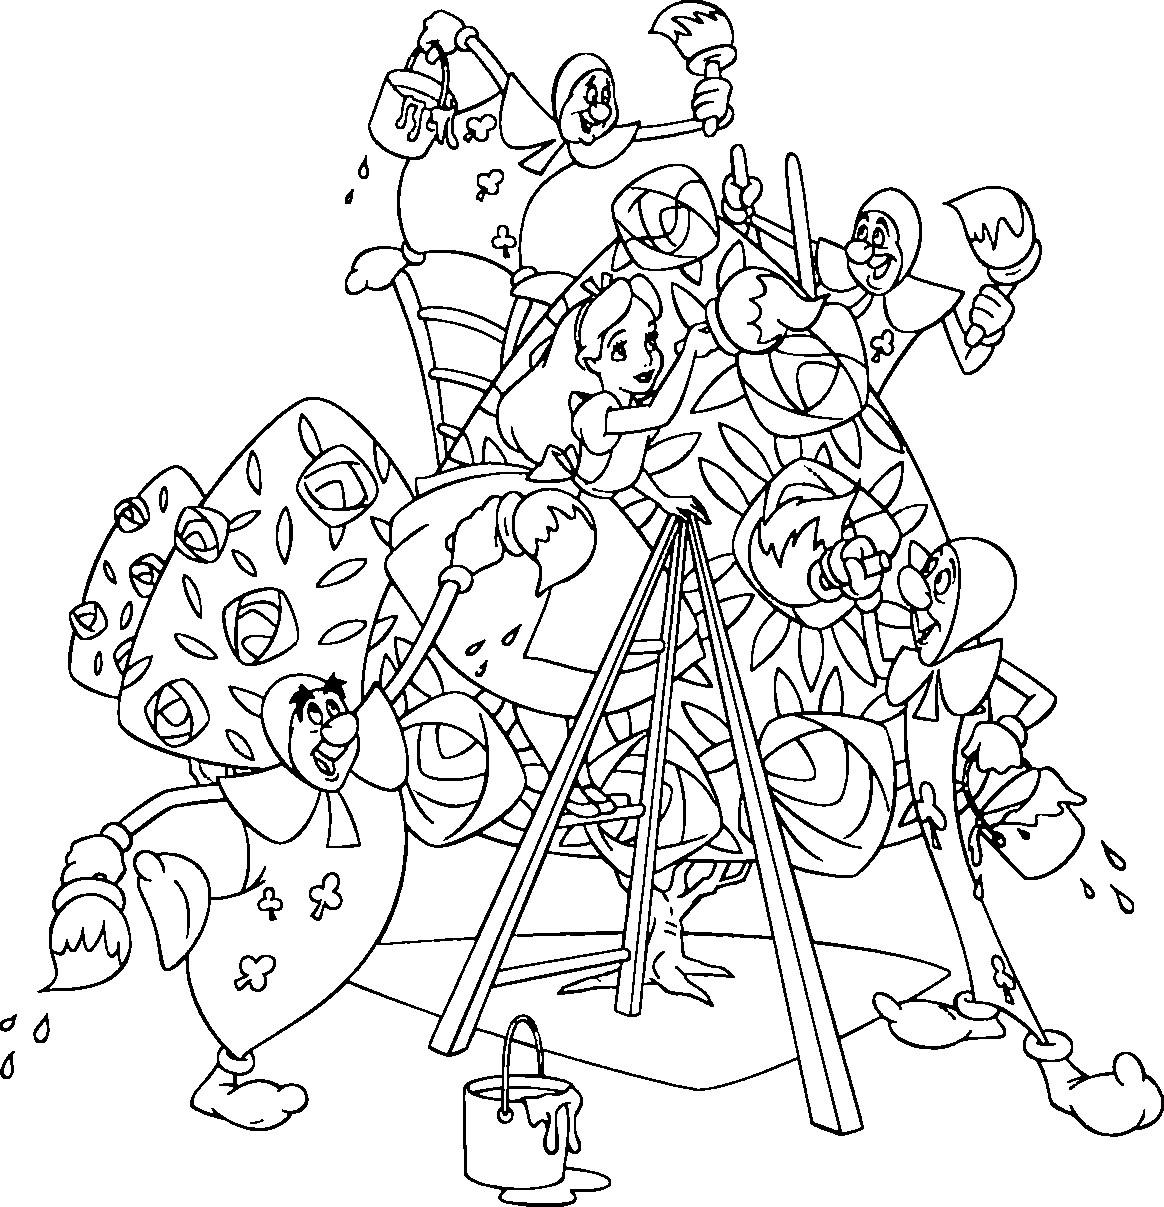 Dionysus Coloring Pages At Getcolorings